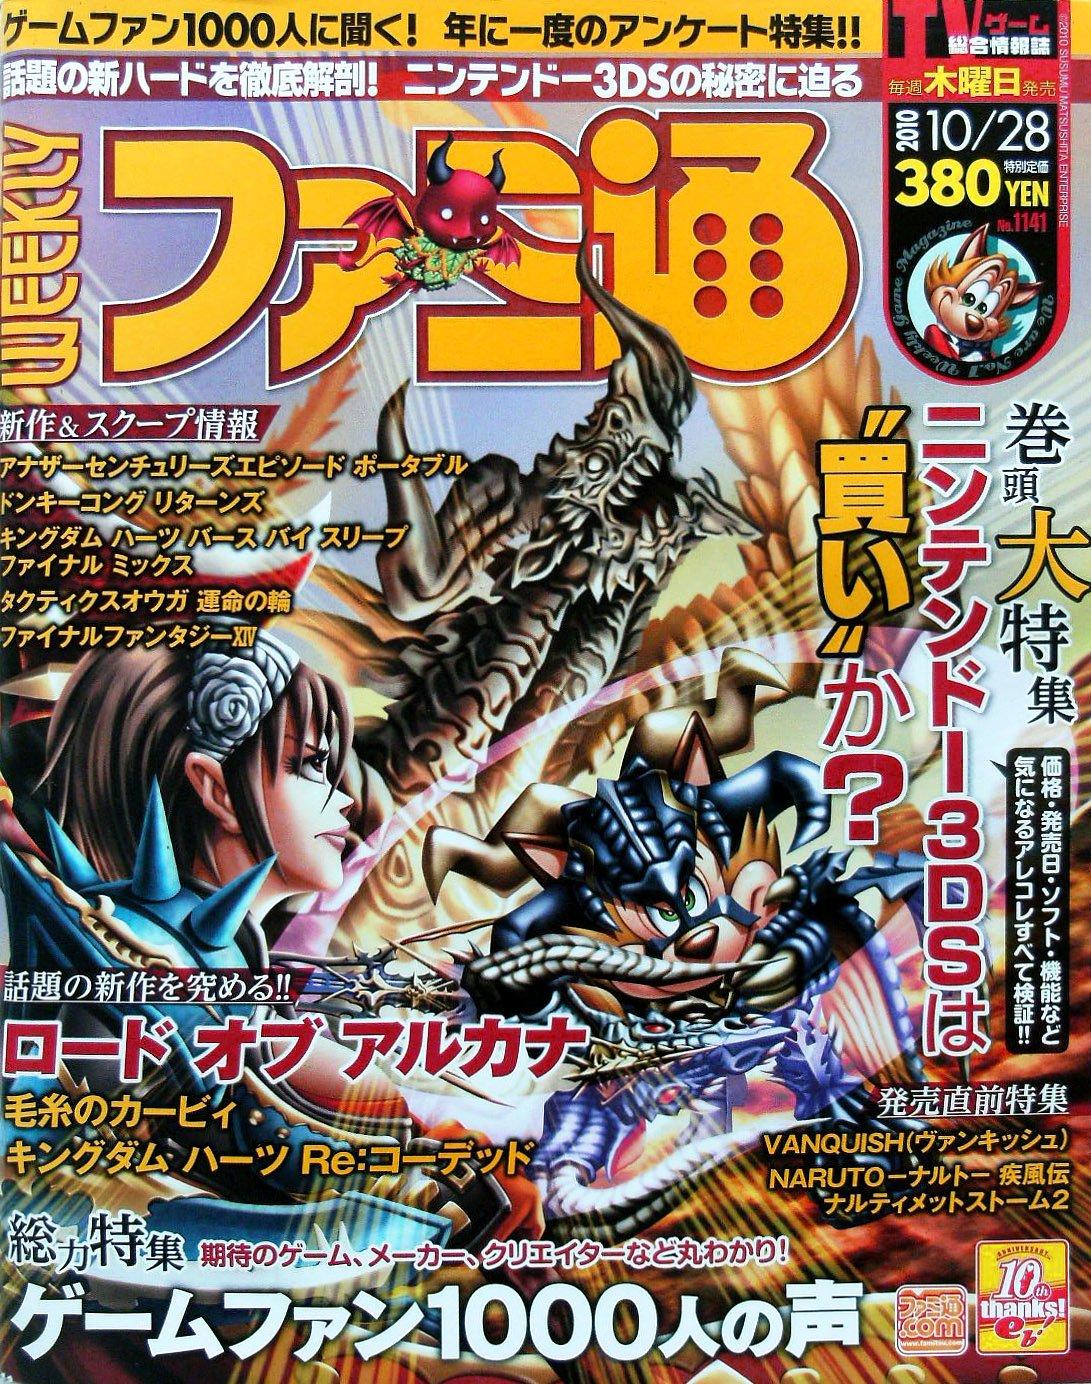 Famitsu 1141 (October 28, 2010)